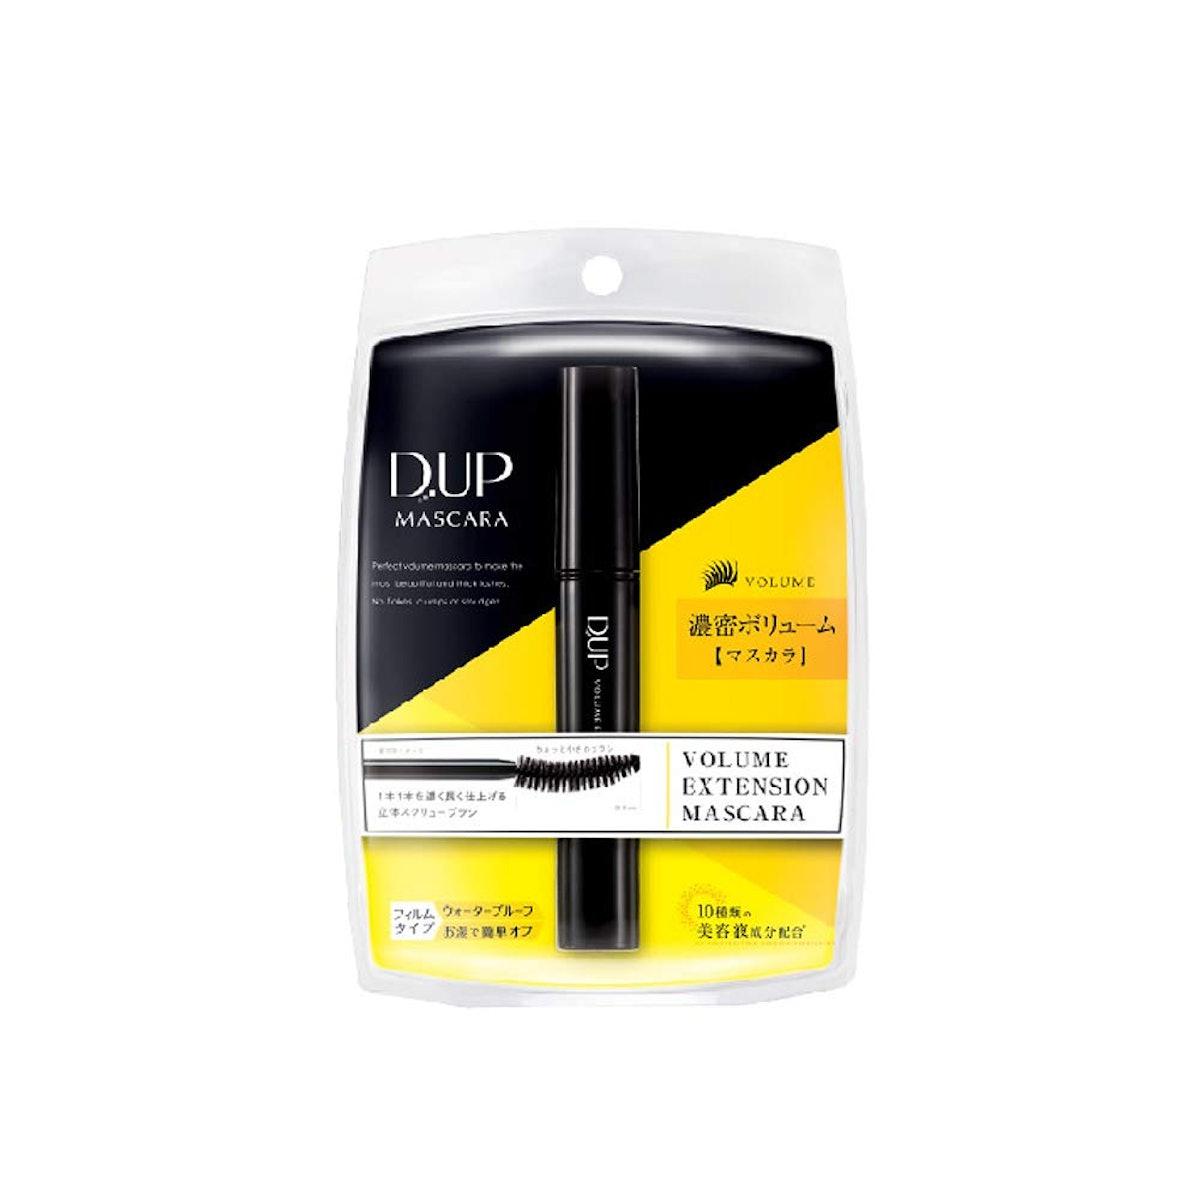 Dee Up Dup Mascara Volume Extension